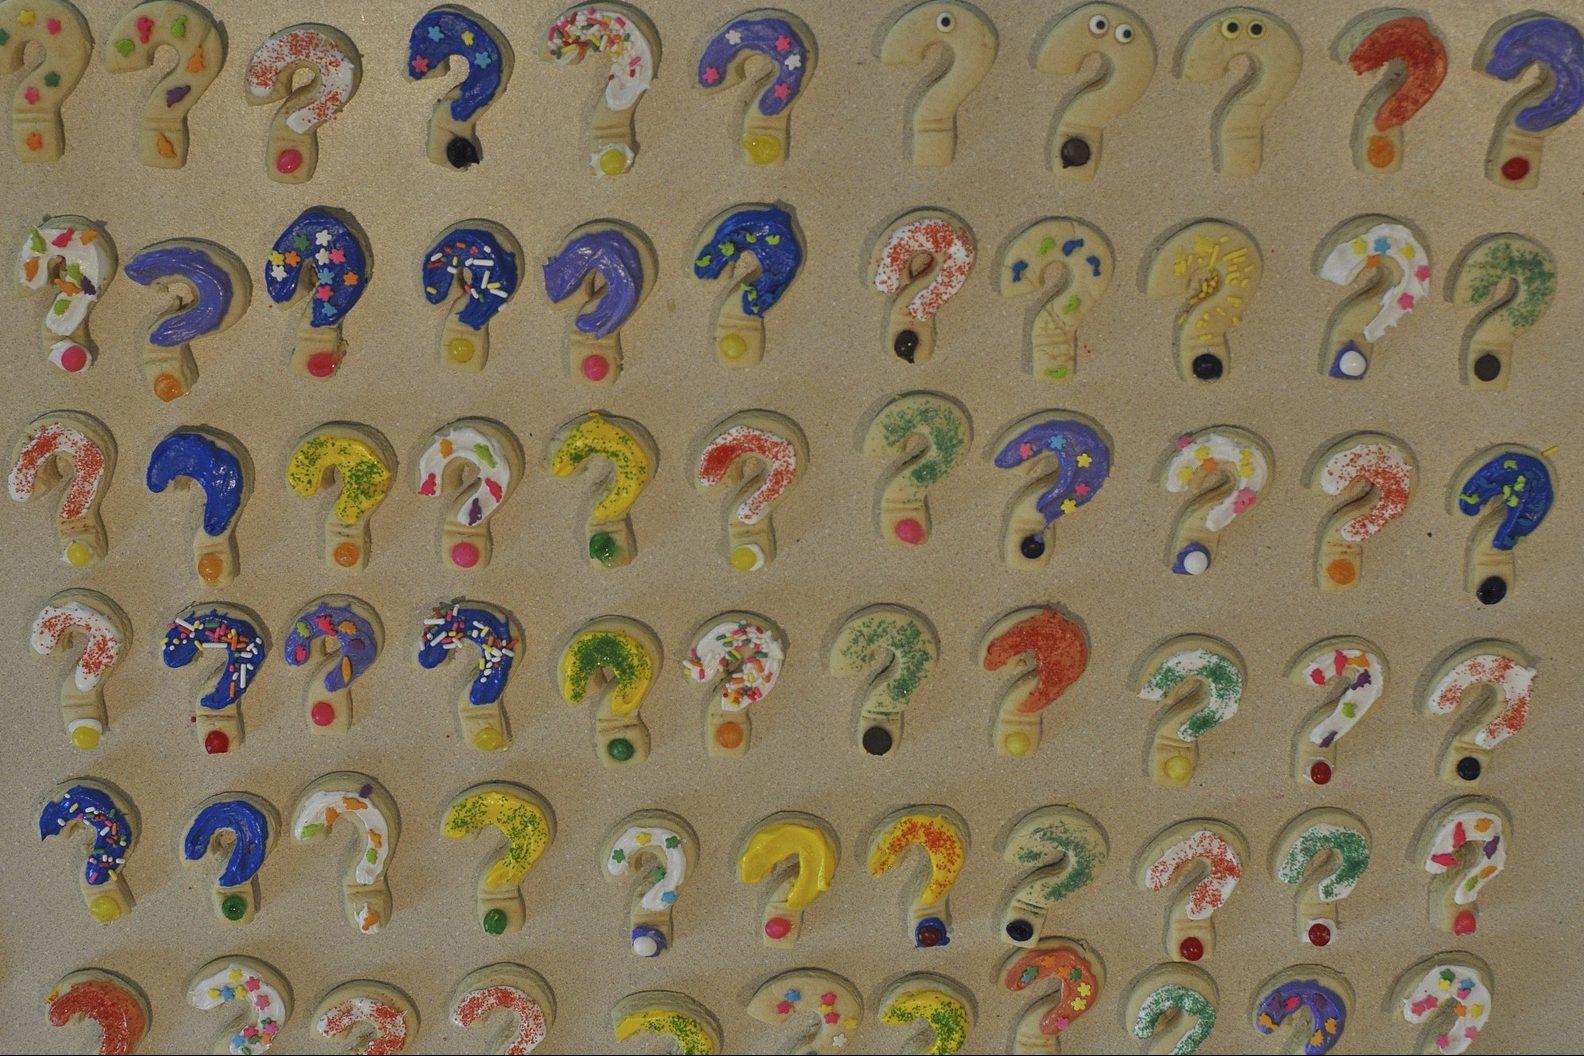 Illustration of multiple question marks